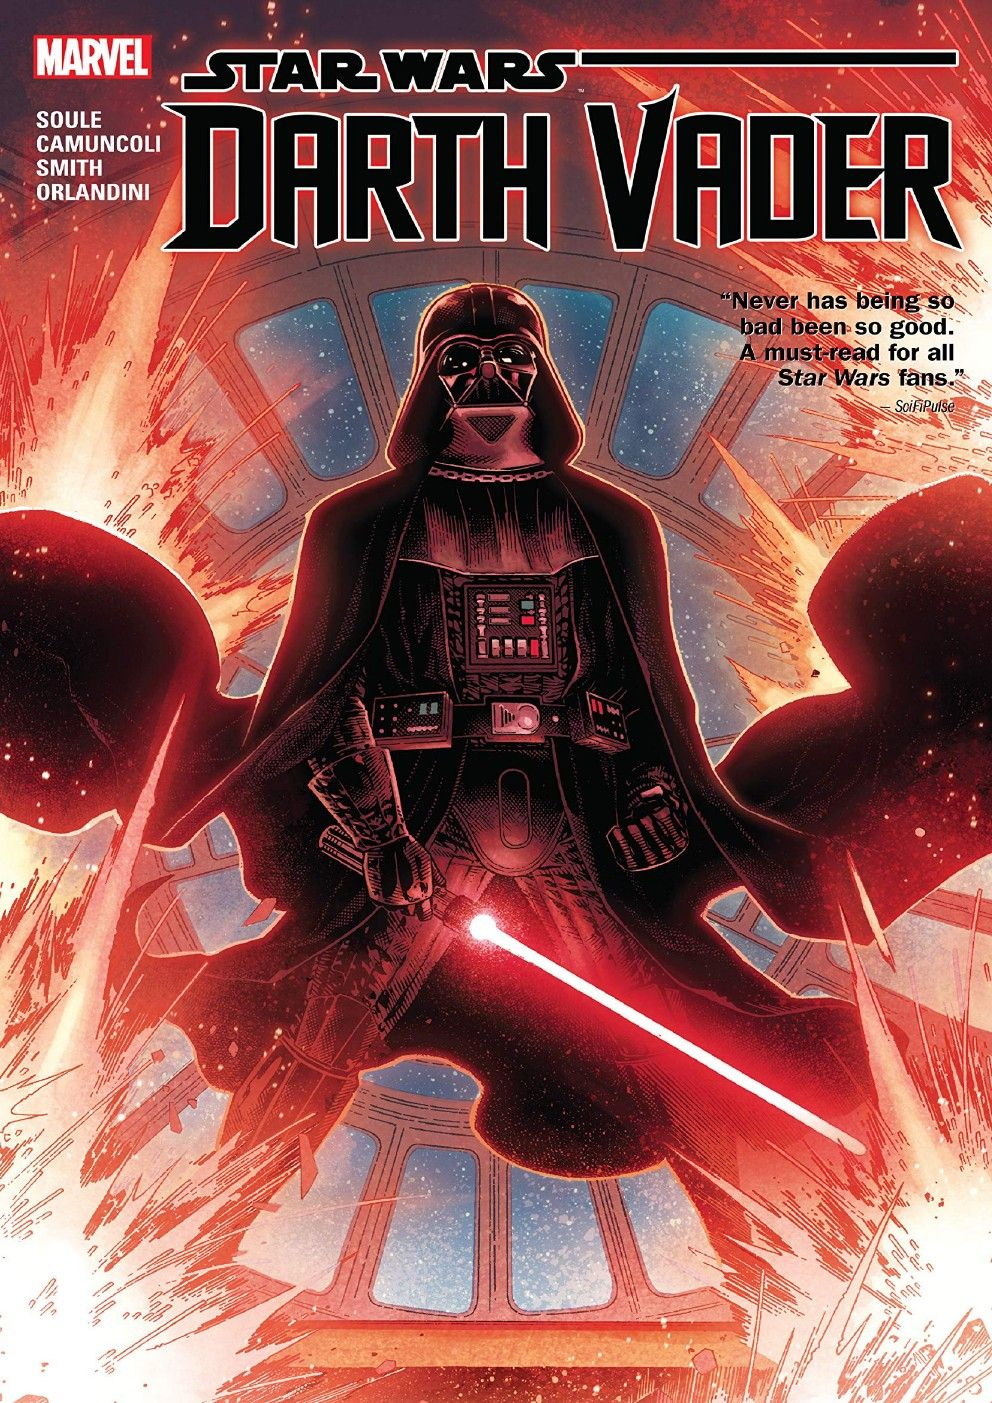 Get Epub Star Wars Darth Vader Dark Lord Of The Sith Vol 1 Collection Darth Vader 2017 201 In 2020 Star Wars Comics Star Wars Darth Vader Dark Lord Of The Sith